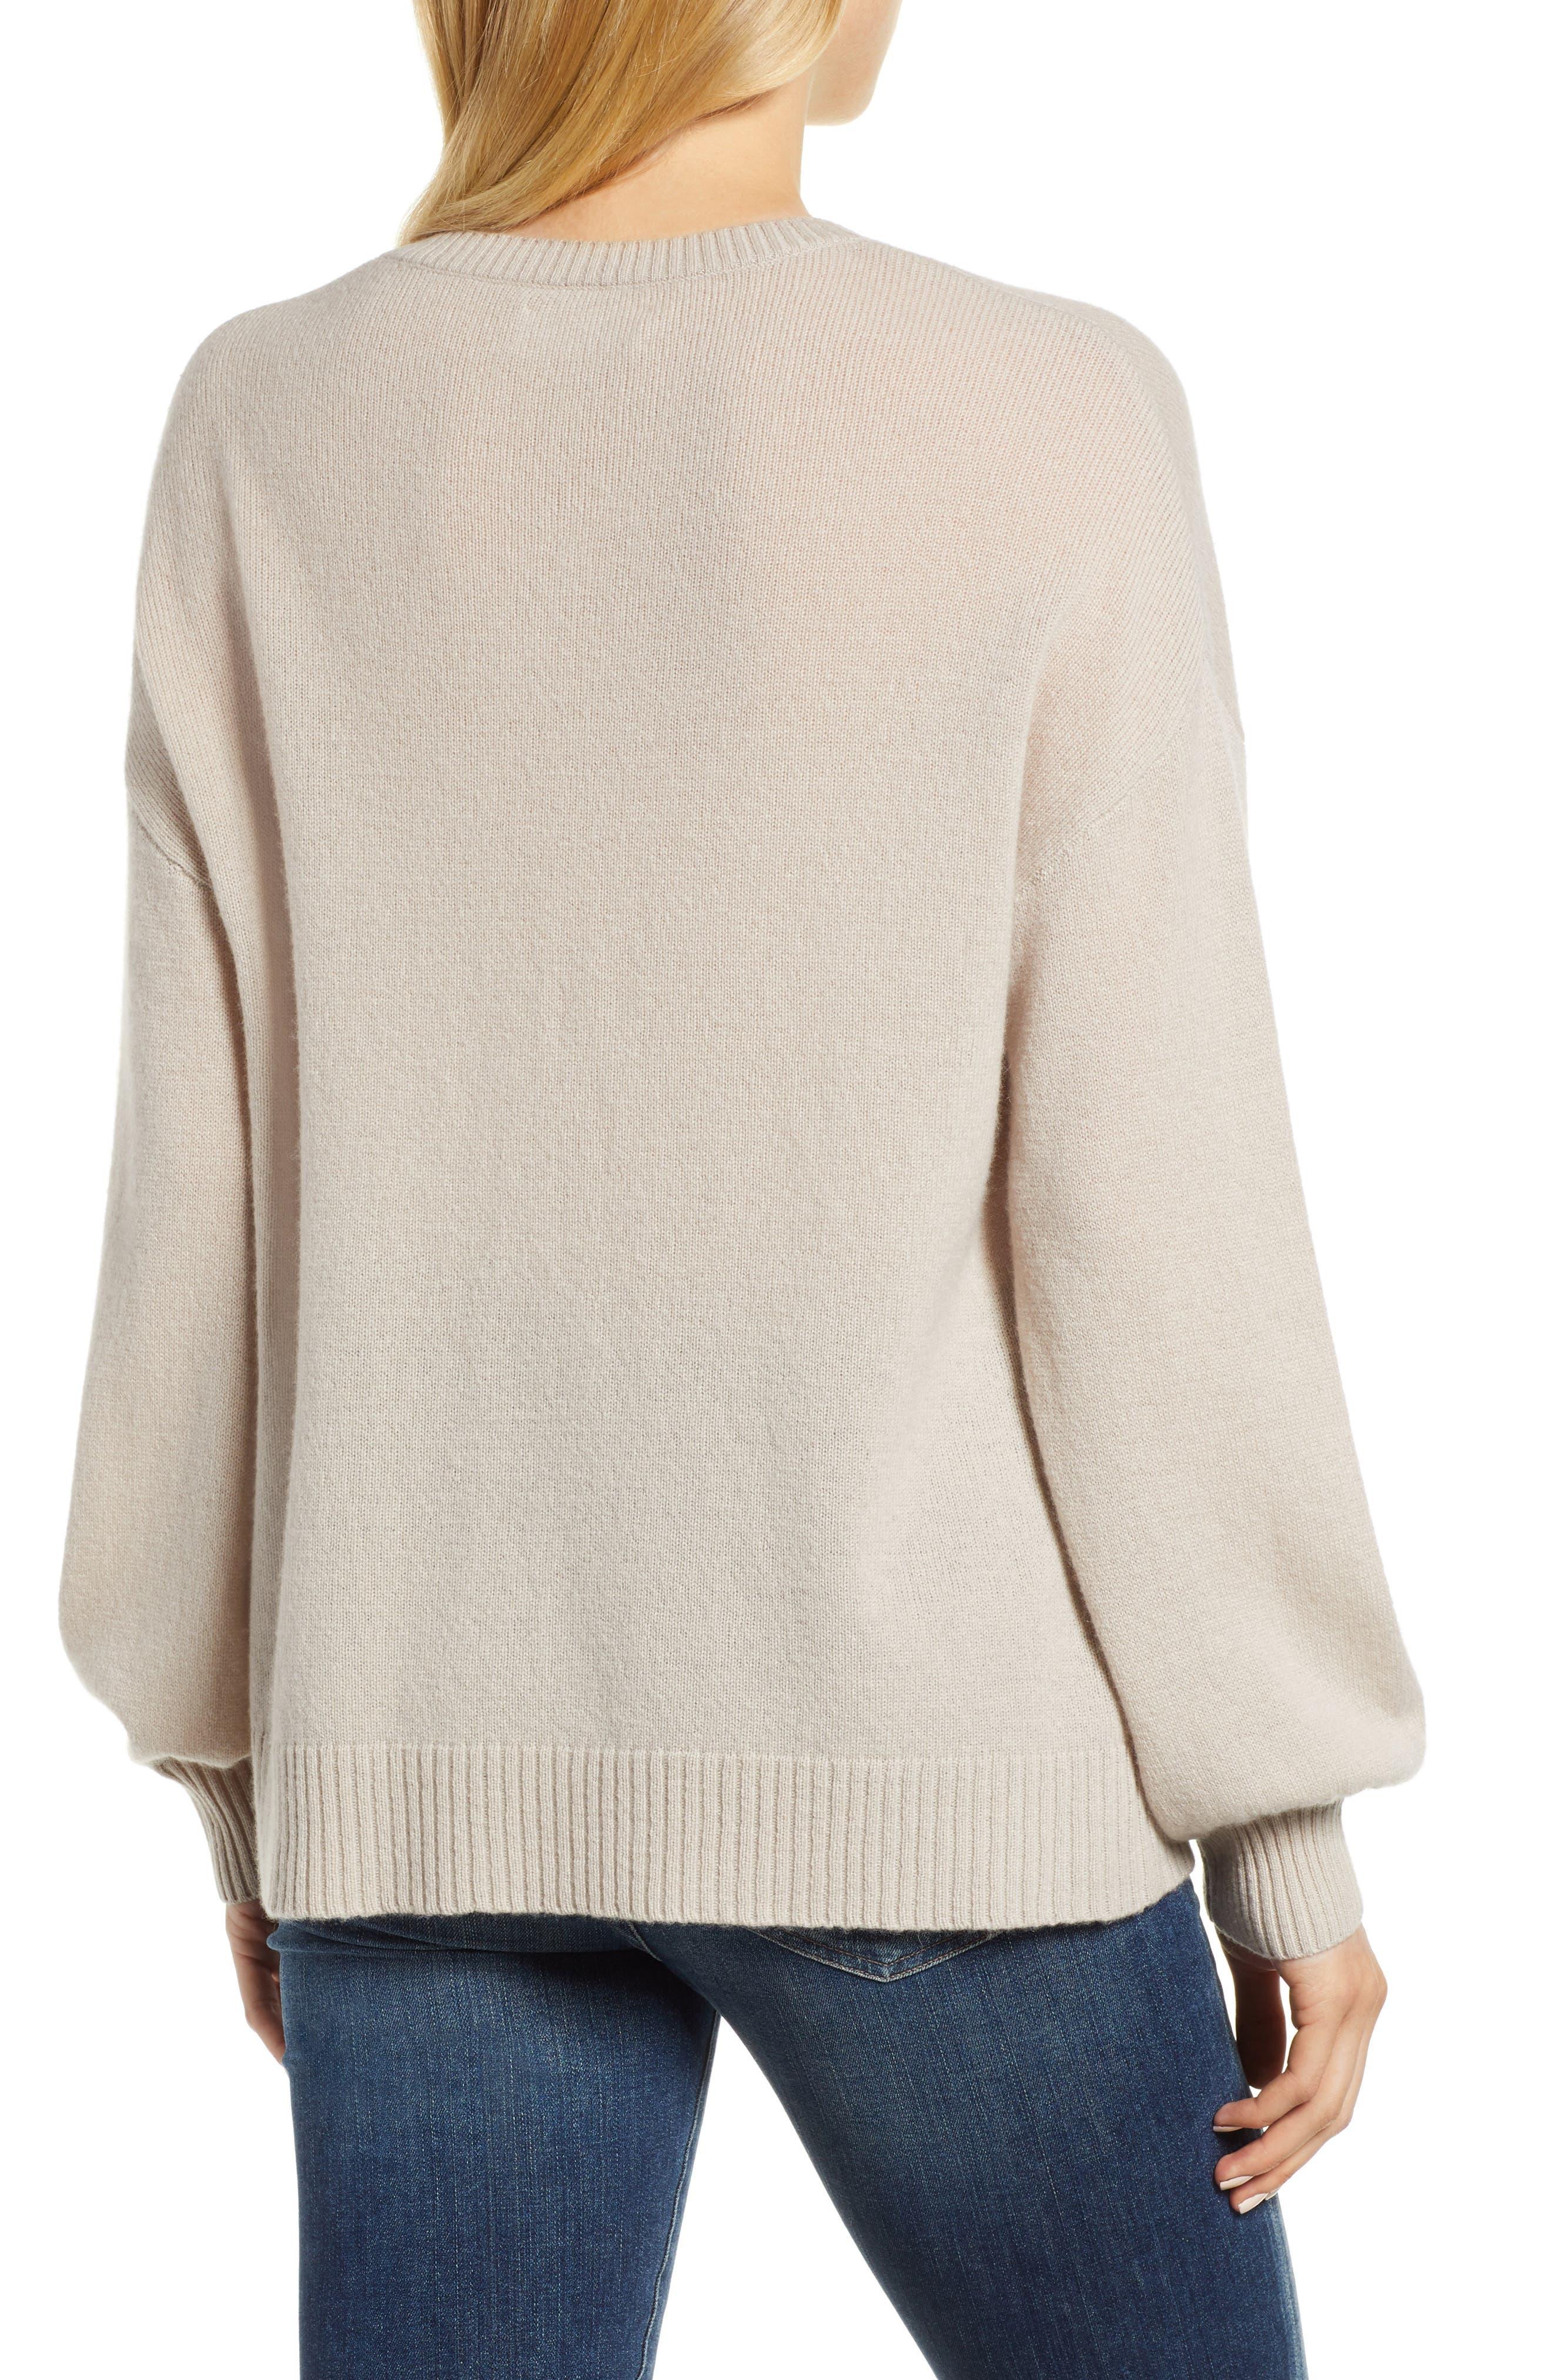 Blouson Sleeve Cashmere Sweater,                             Alternate thumbnail 2, color,                             MUSHROOM